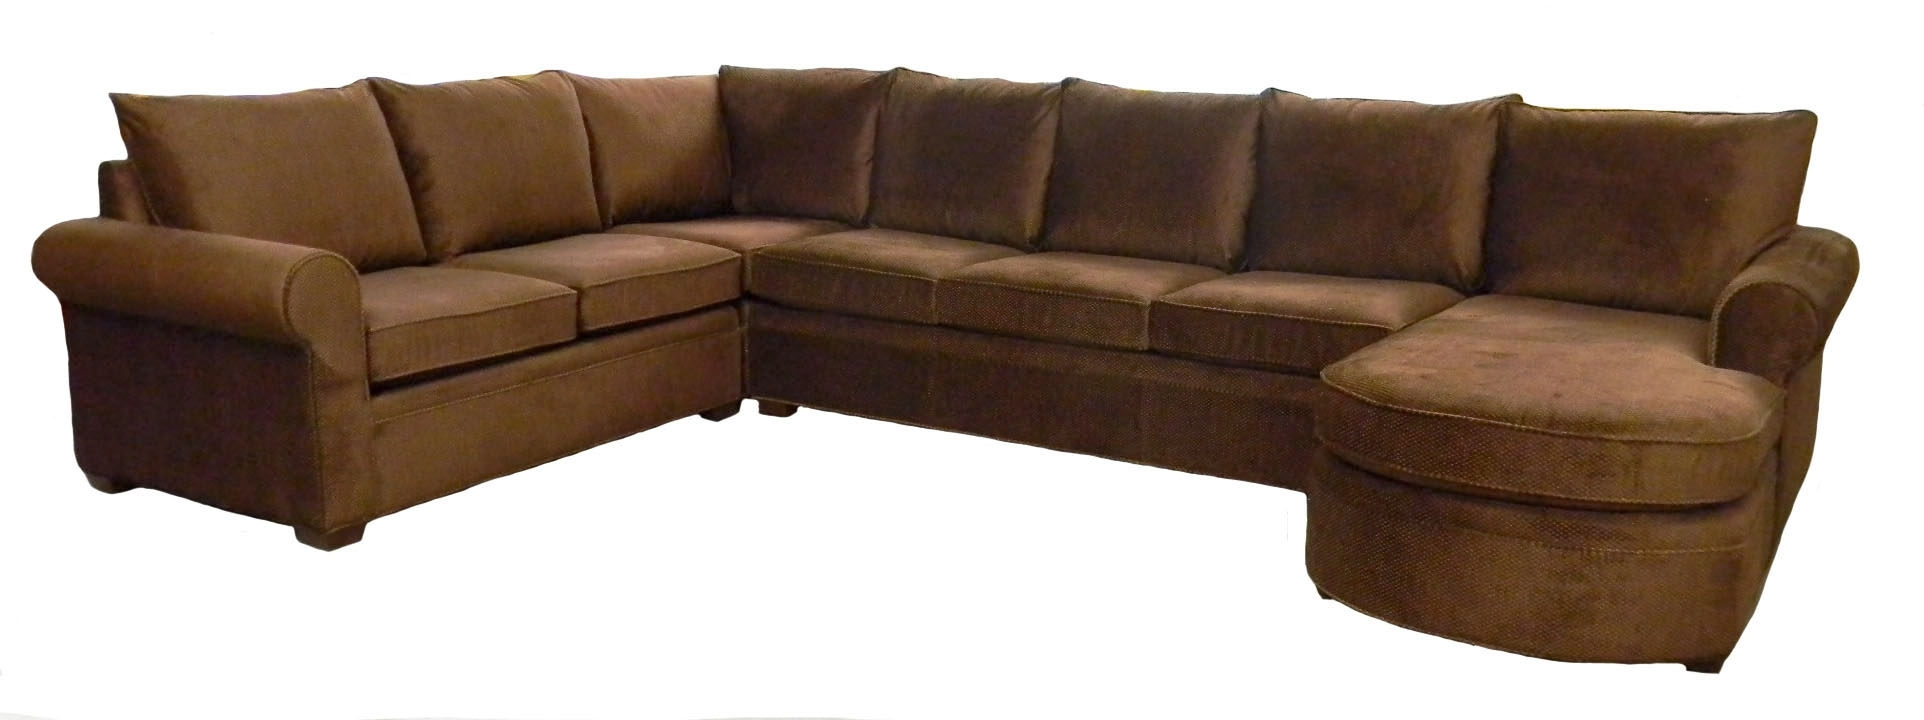 Beautiful Sectional Sofas Denver 18 Modern Sofa Inspiration With Inside Denver Sectional Sofas (View 2 of 10)